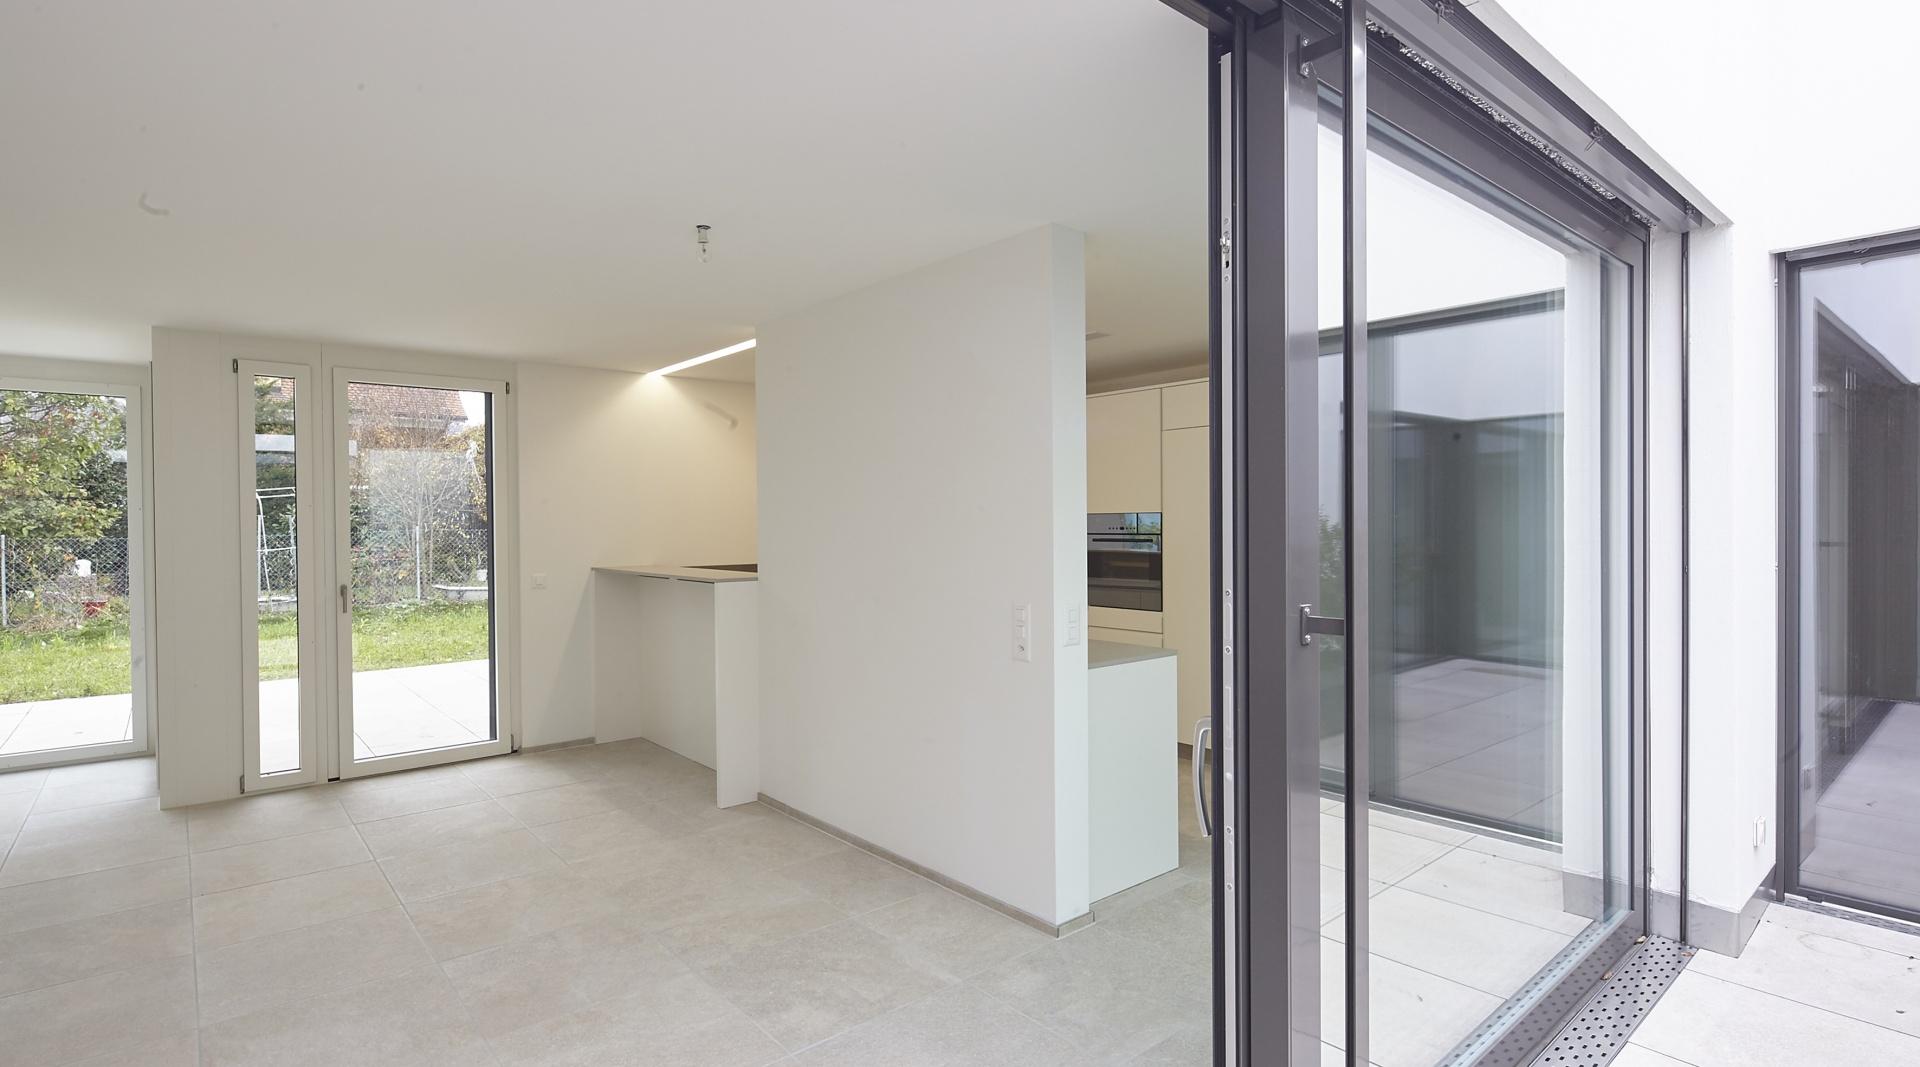 Stollturm_Gartenhaus_Kueche  © Architektur Rolf Stalder AG / Maria Gambino